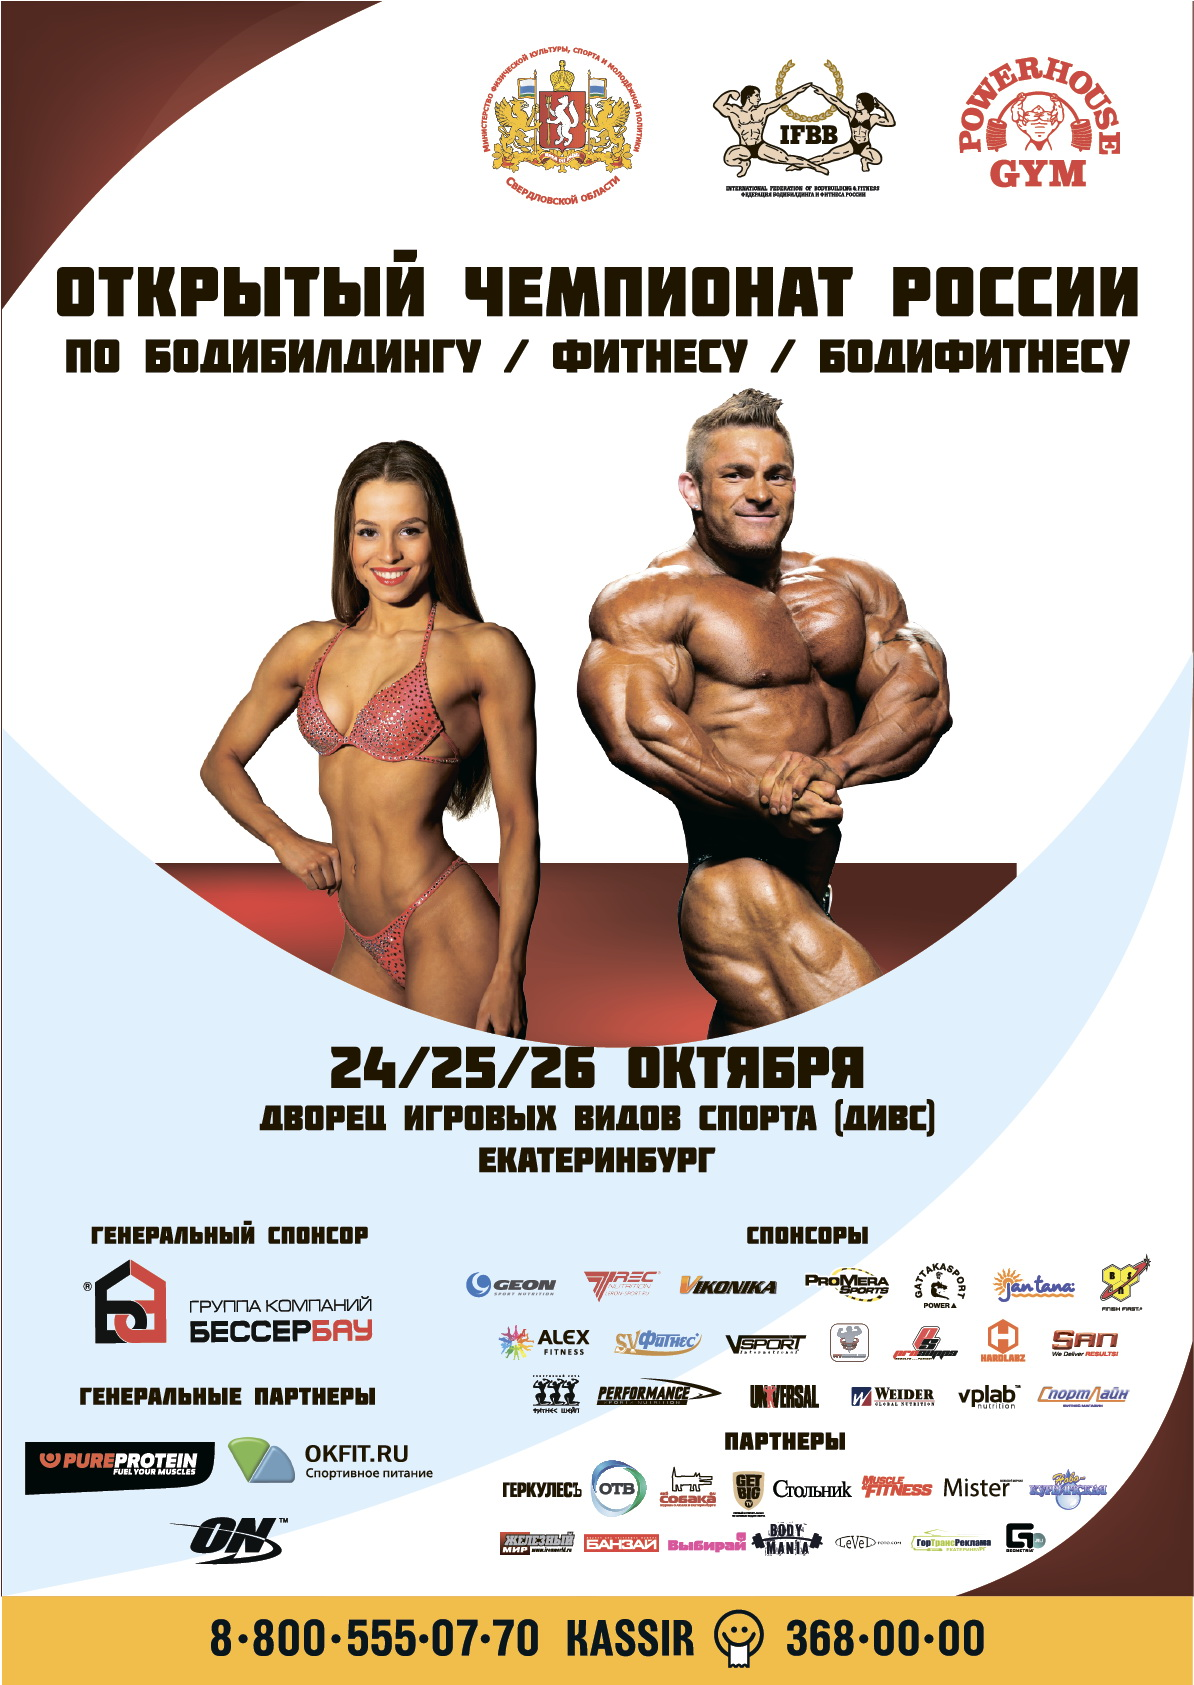 ФБФР Чемпионат России по бодибилдингу - 2014 (Екатеринбург)